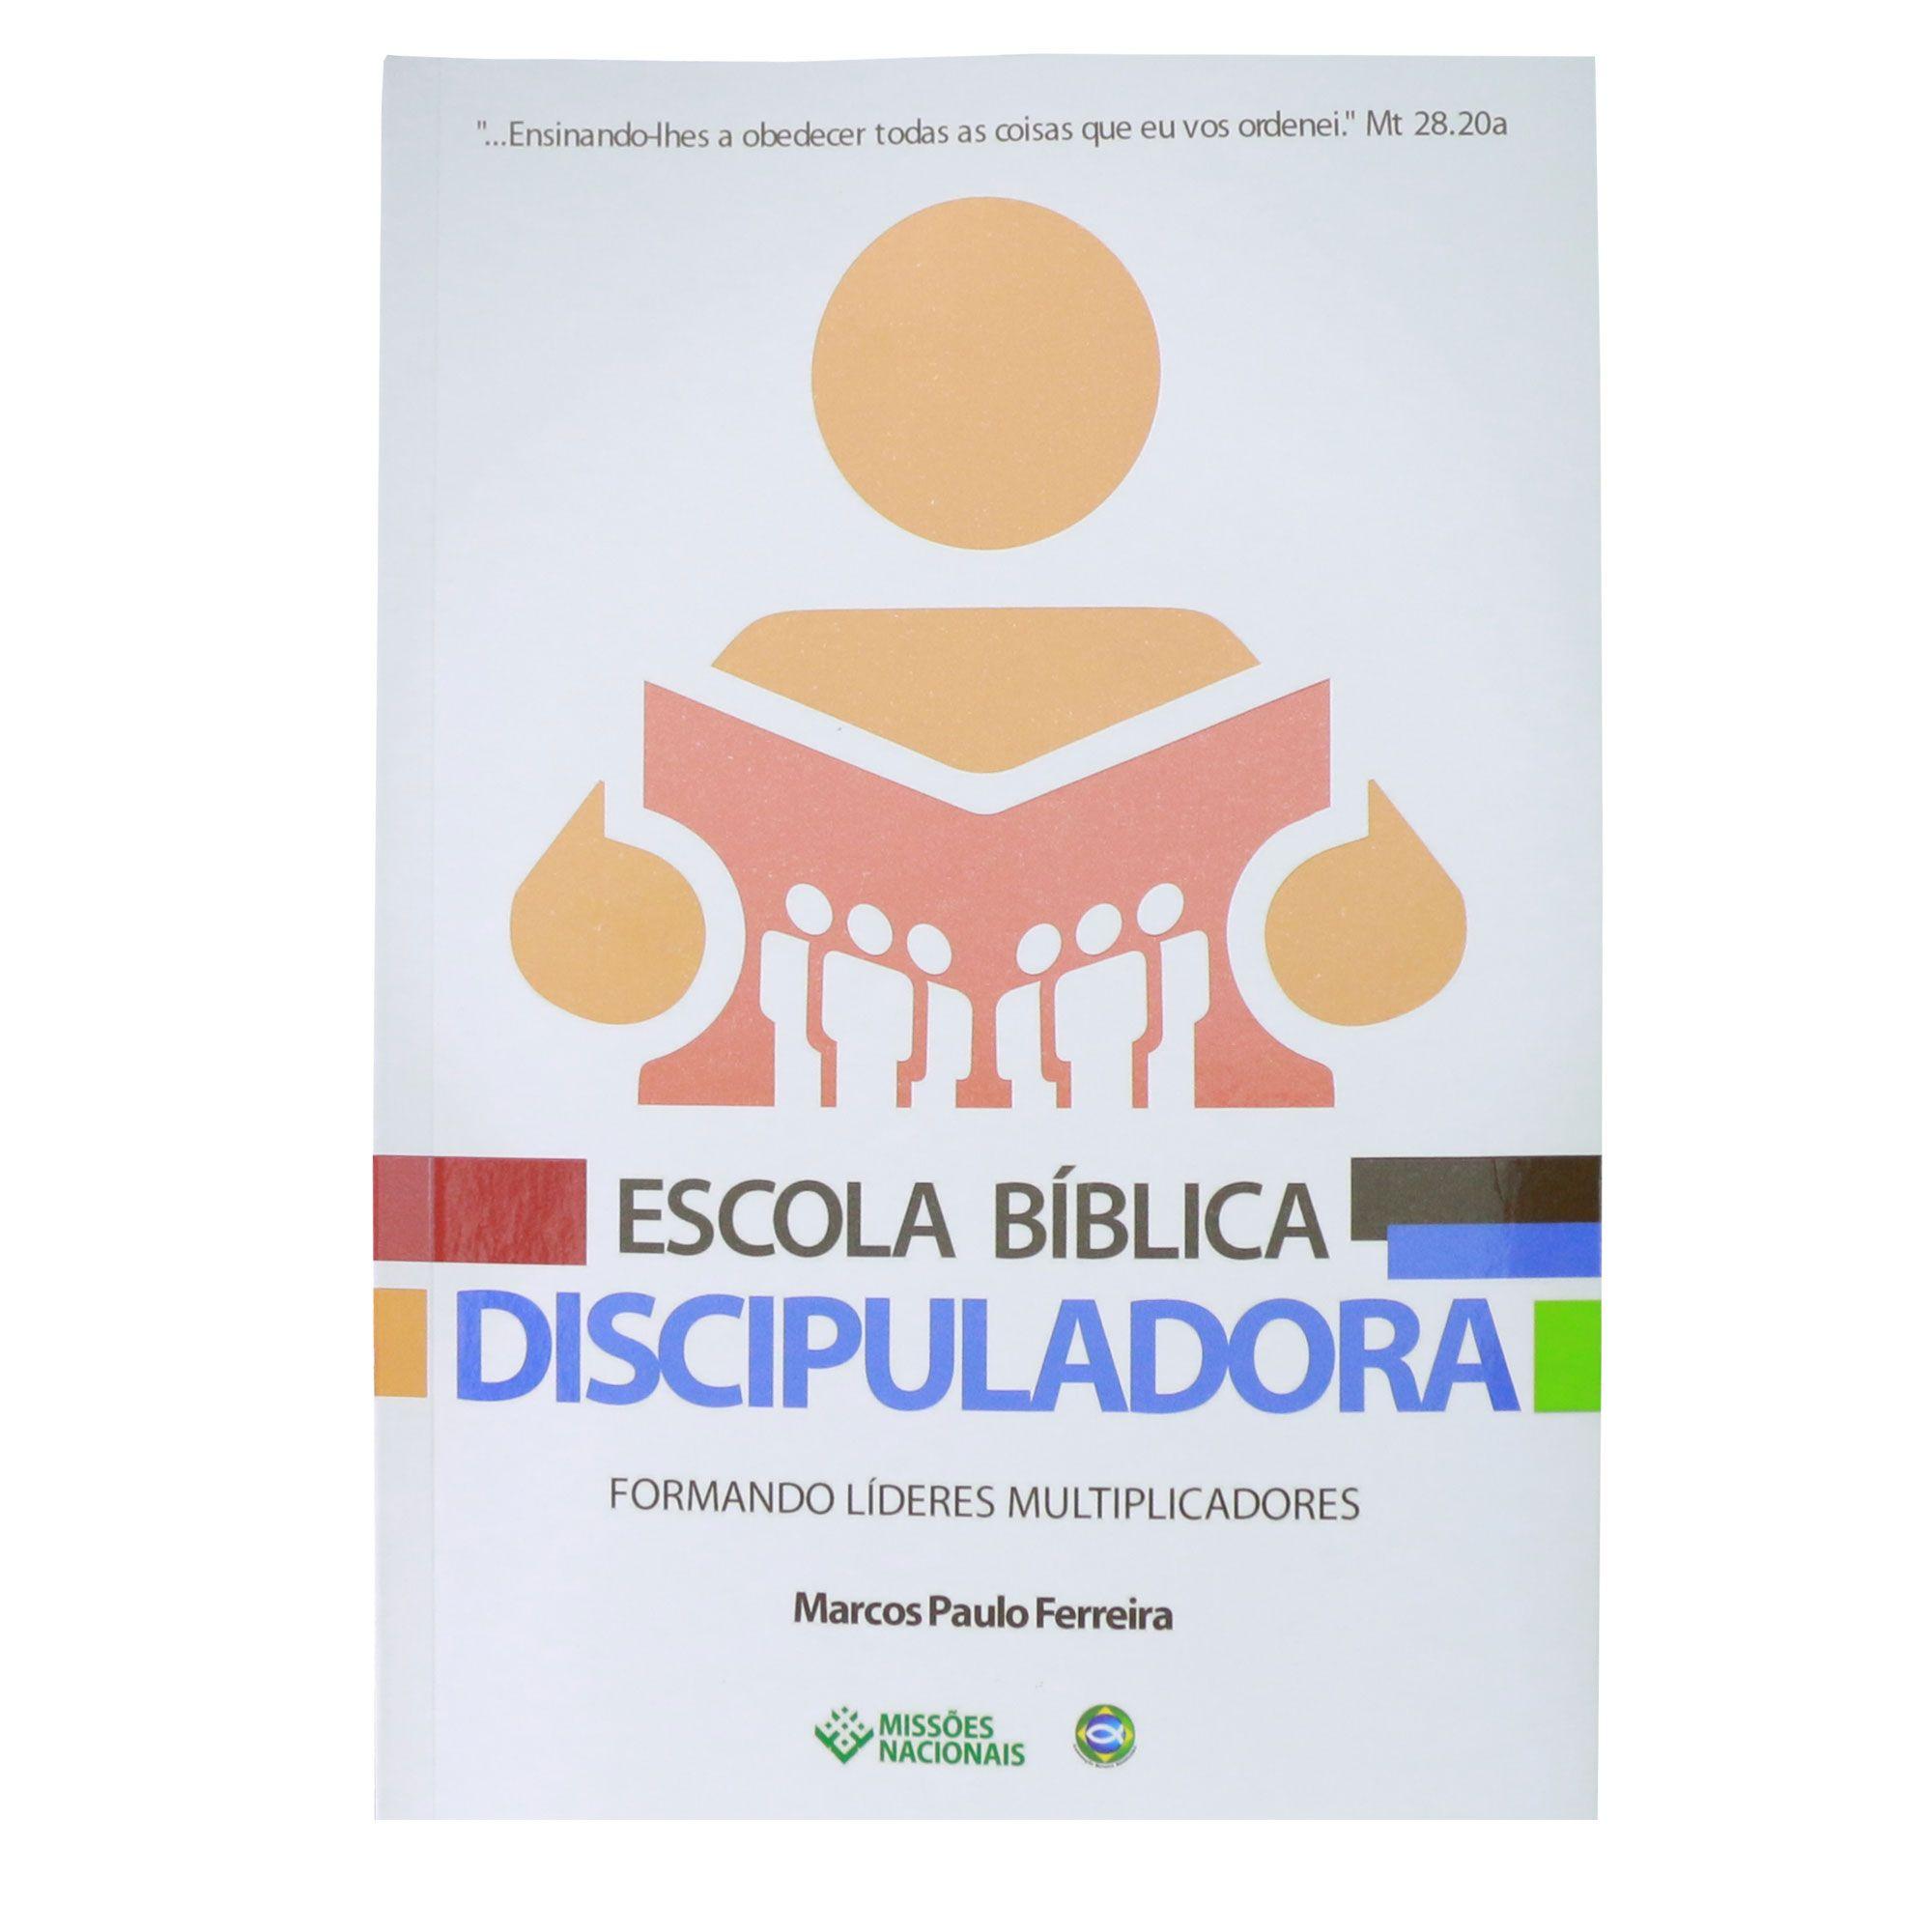 Escola Bíblica Discipuladora - Formando Líderes Multiplicadores